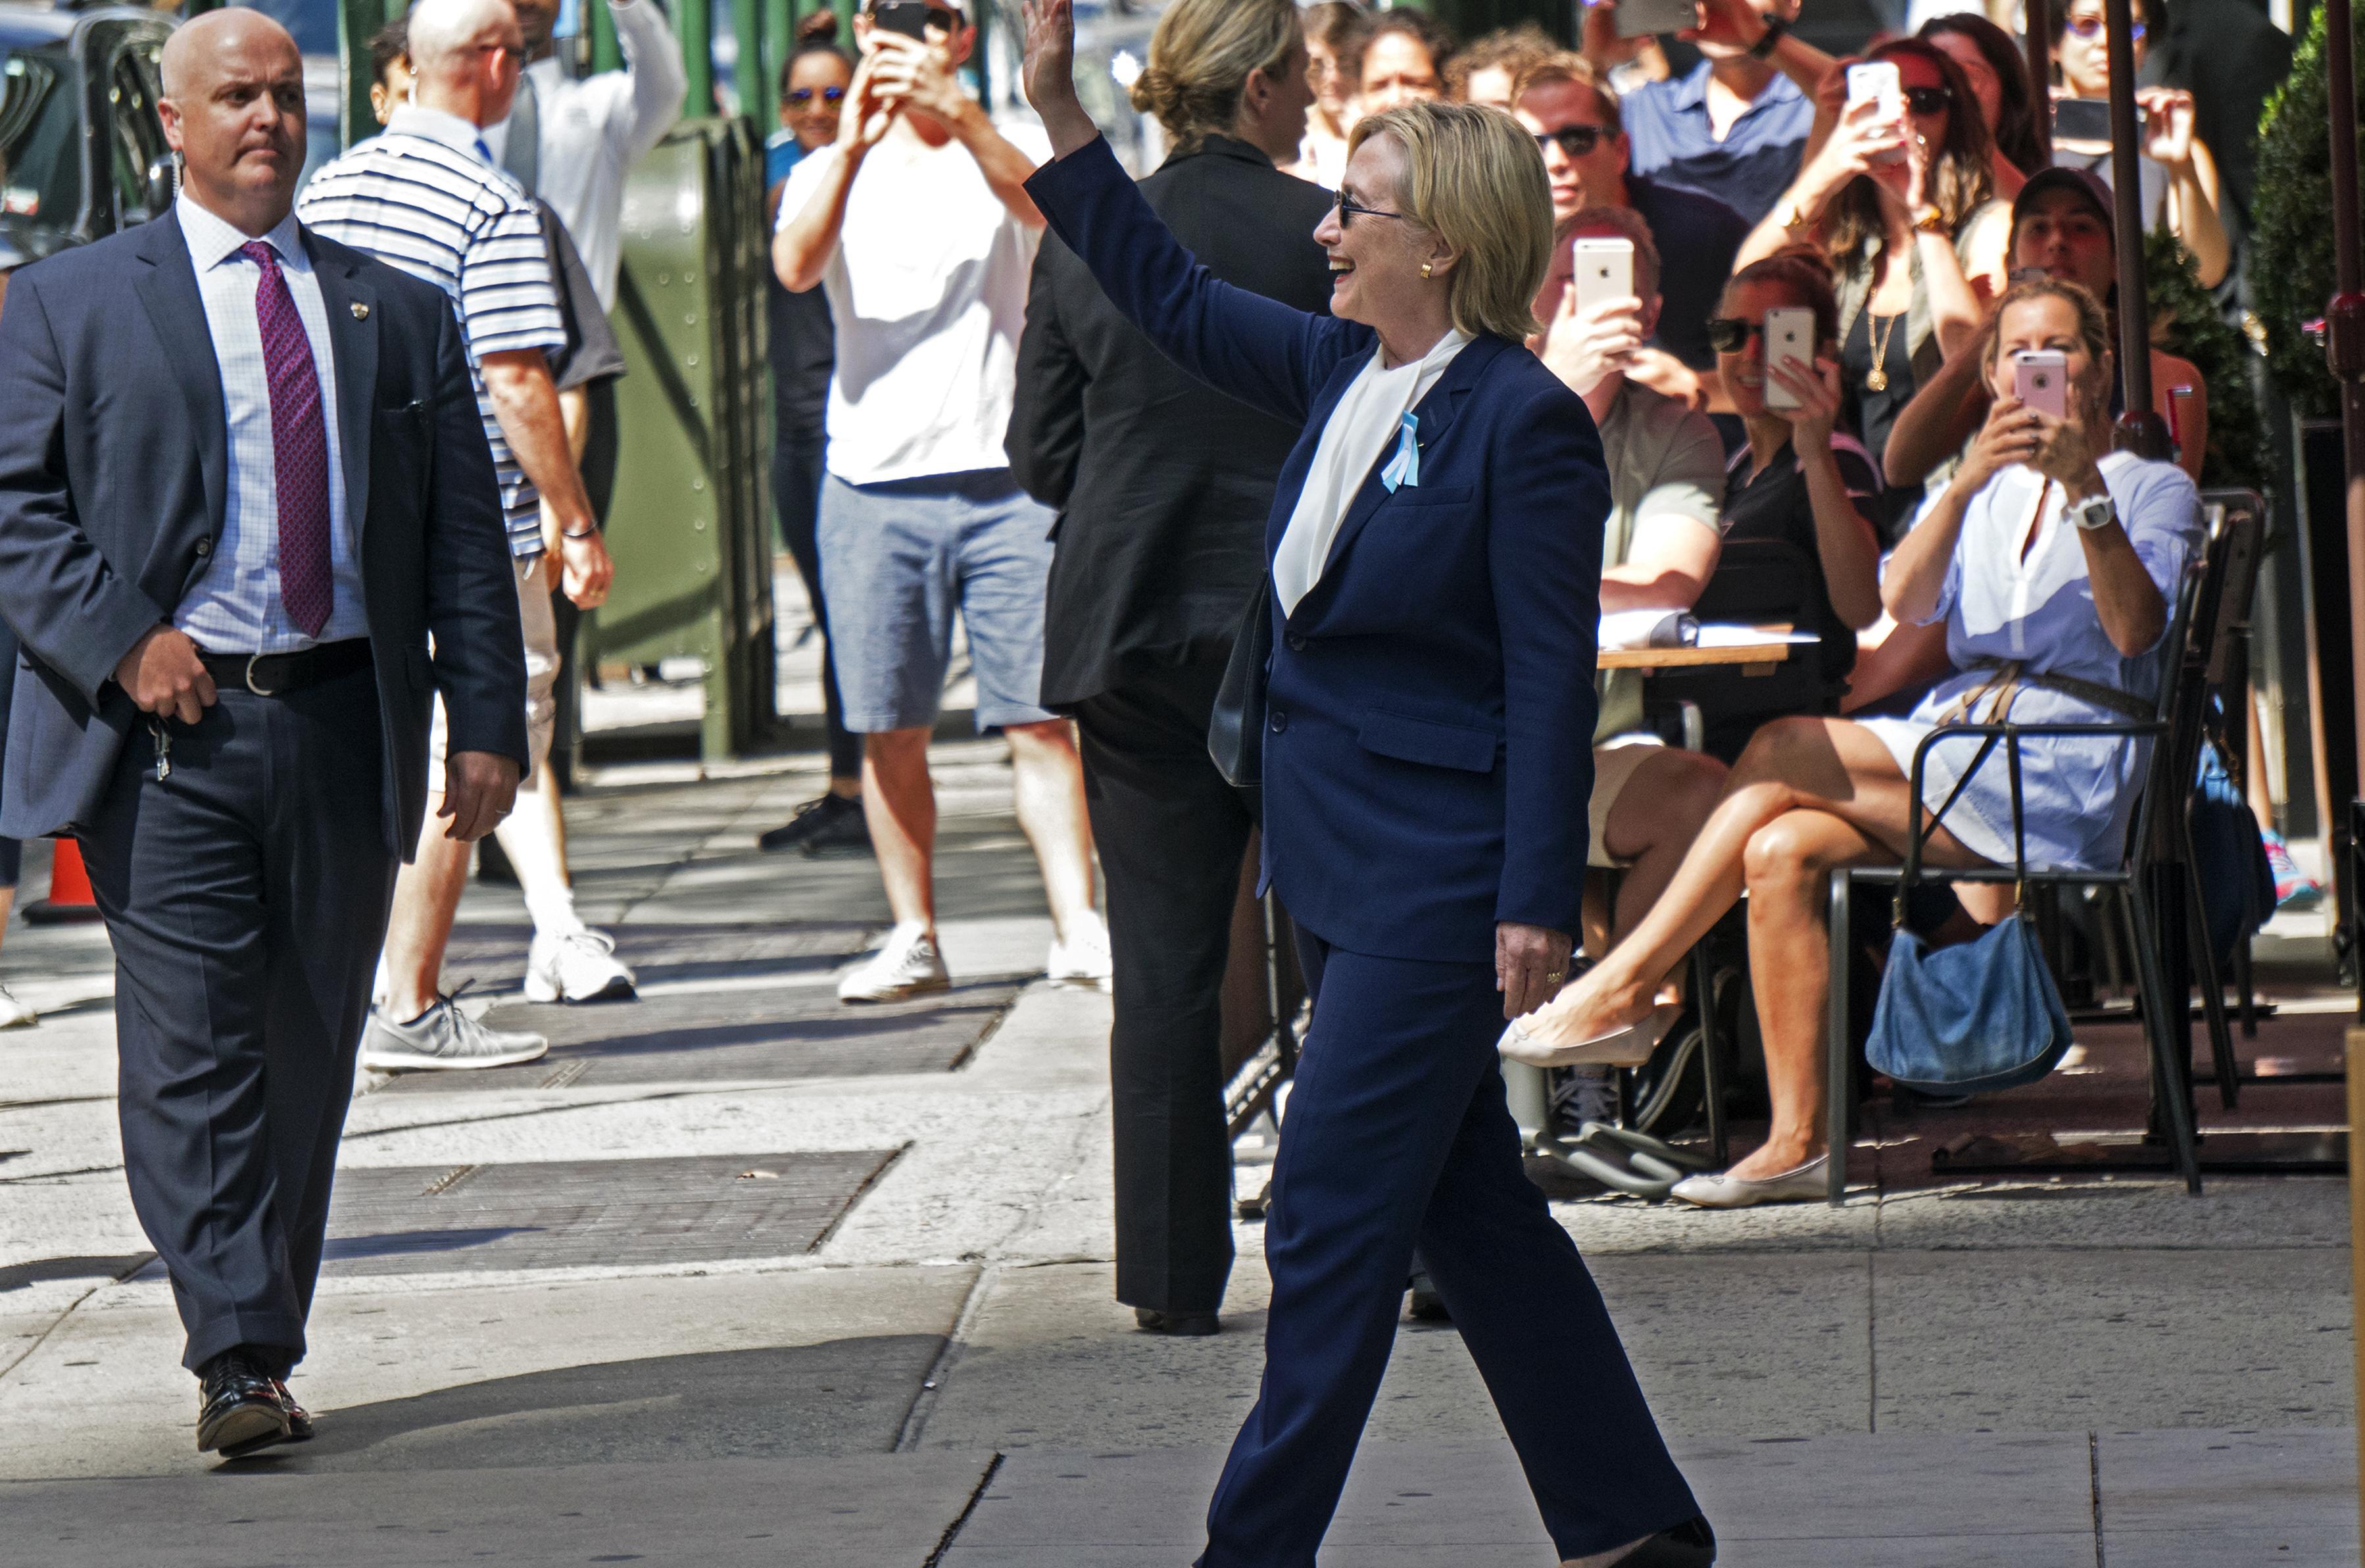 hill Campaign_2016_Clinton_JPG_E94HvjZ.jpg